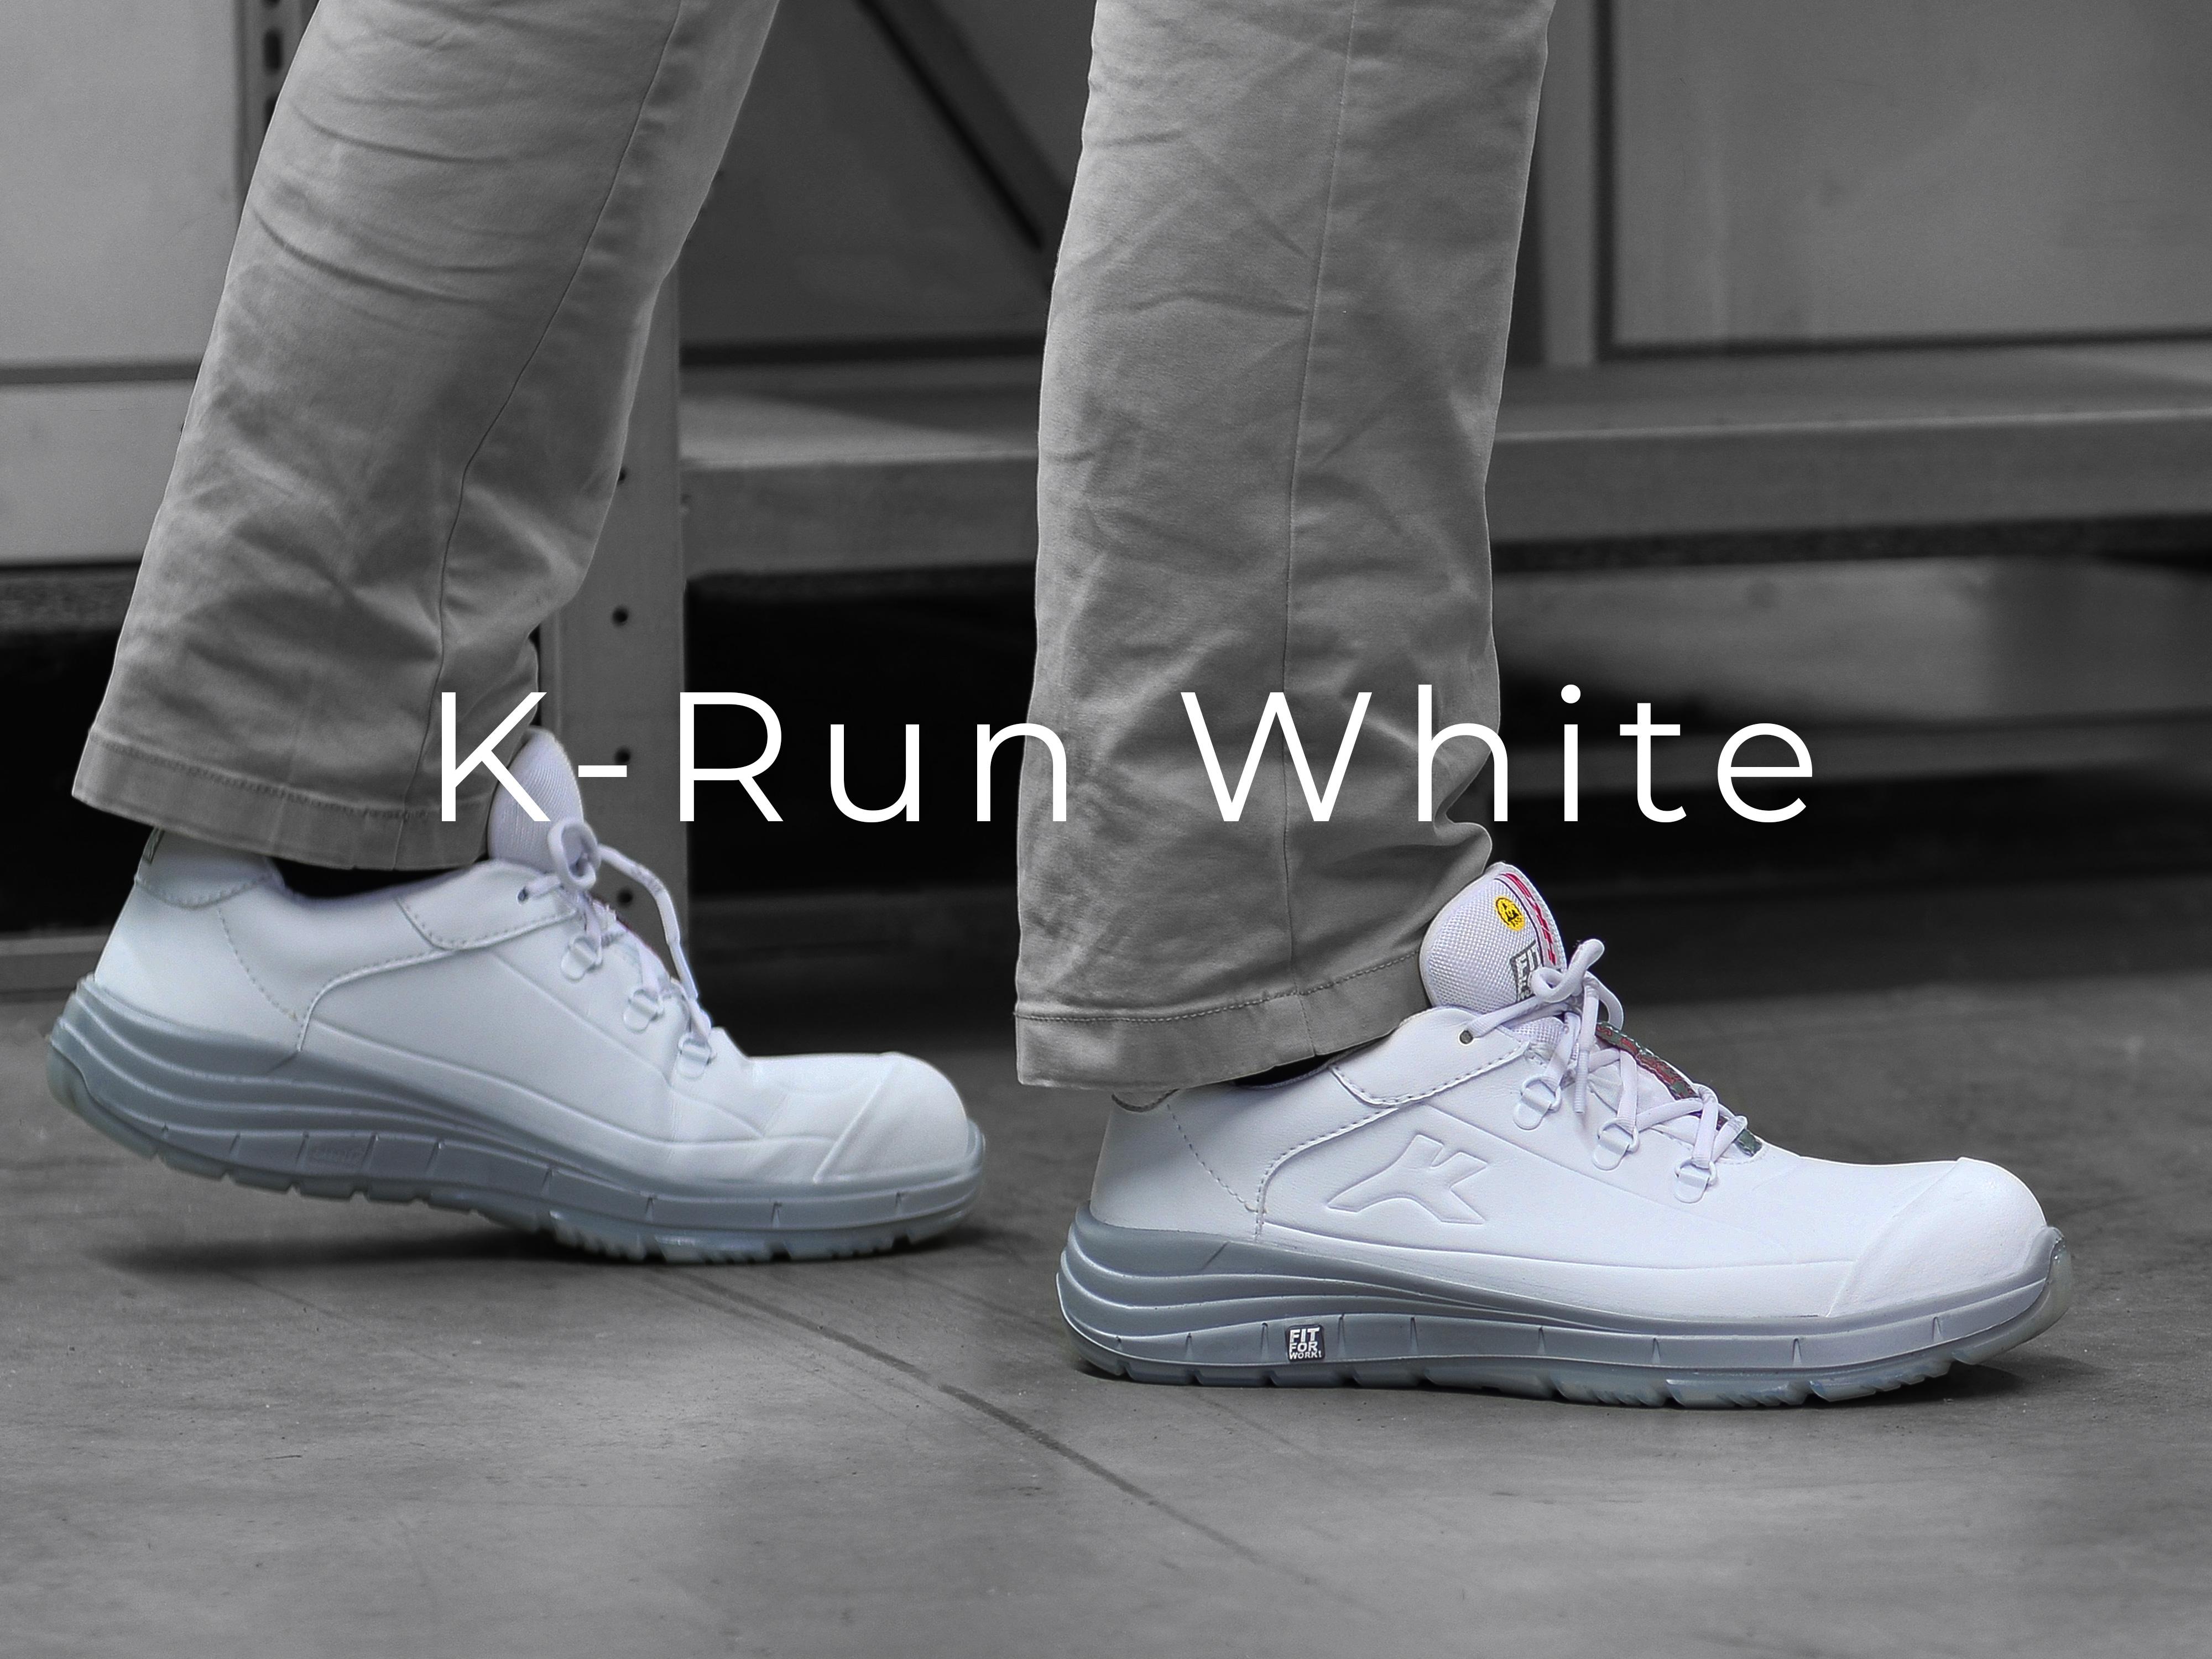 K-Run White